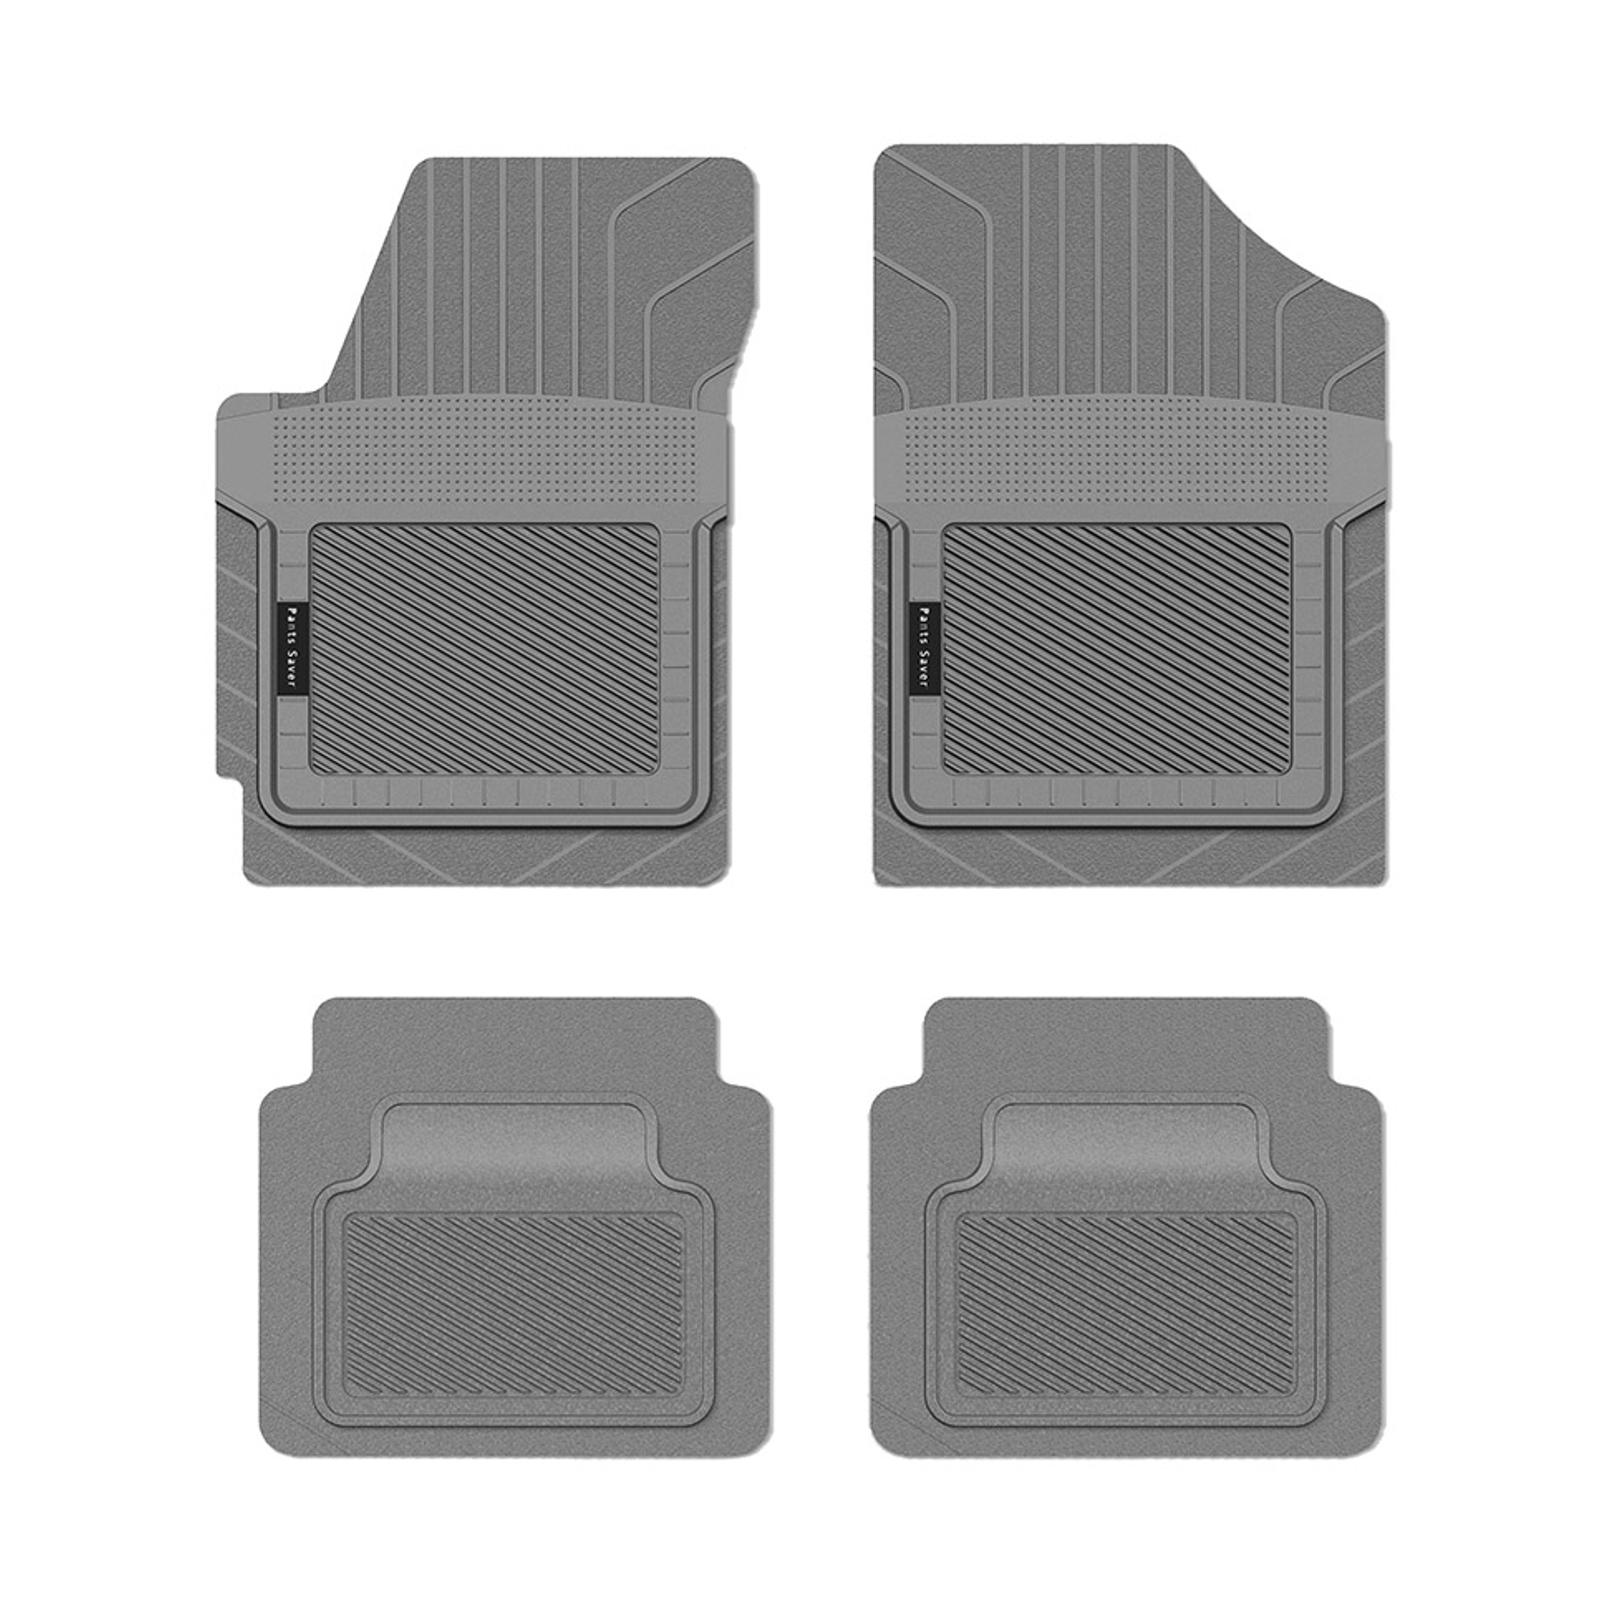 Koolatron Pants Saver Custom Fit Car Mat 4PC Nissan Xterra 2015 Tan PartNumber: 02819249000P KsnValue: 082V009794597000 MfgPartNumber: 2922153